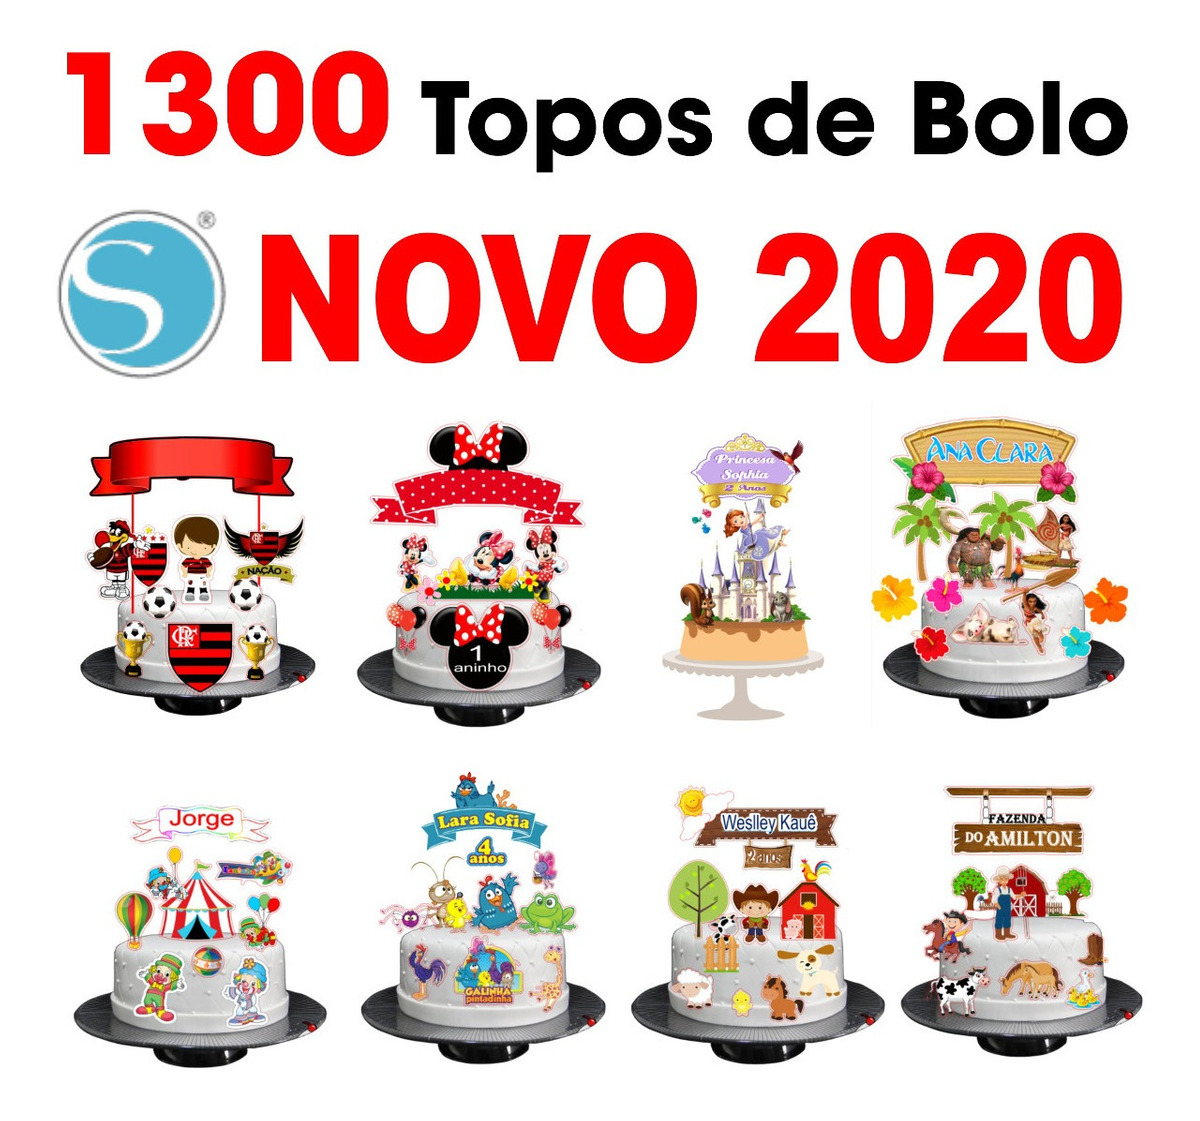 Kit 2020 Topo De Bolo De 1300 Arquivos De Corte Silhouette R